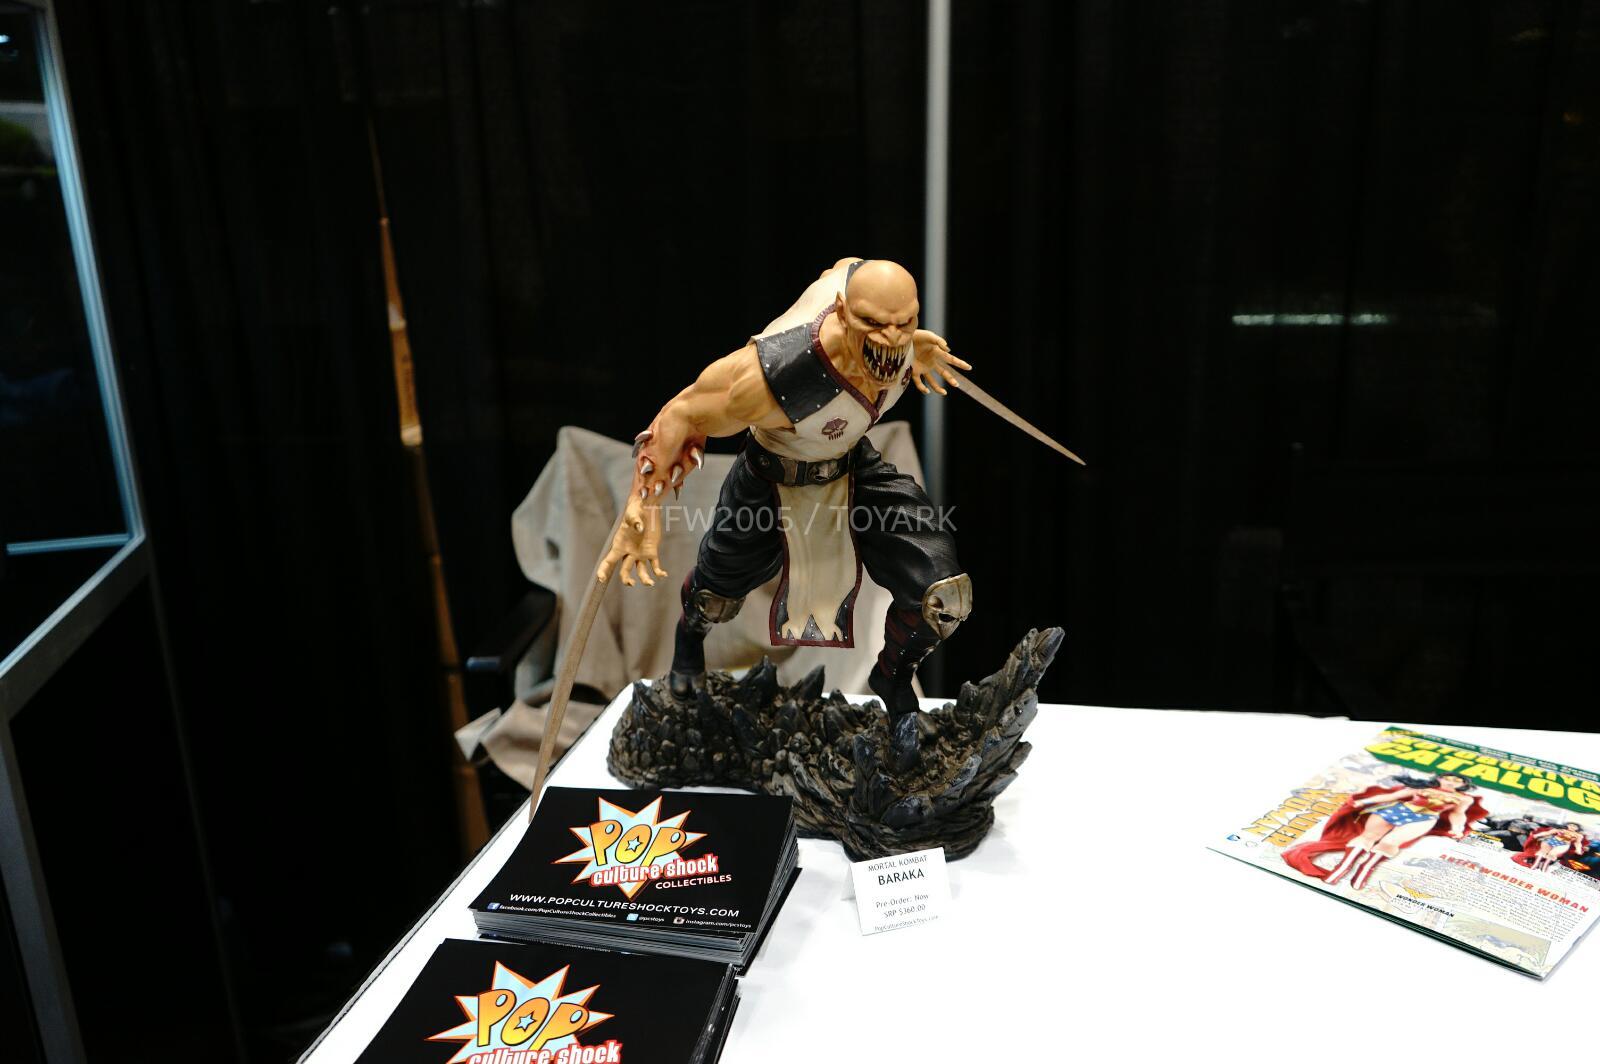 [Pop Culture Shock] Mortal Kombat 9 - Baraka 1/4 scale - Página 3 NYCC-2014-Pop-Culture-Shock-007